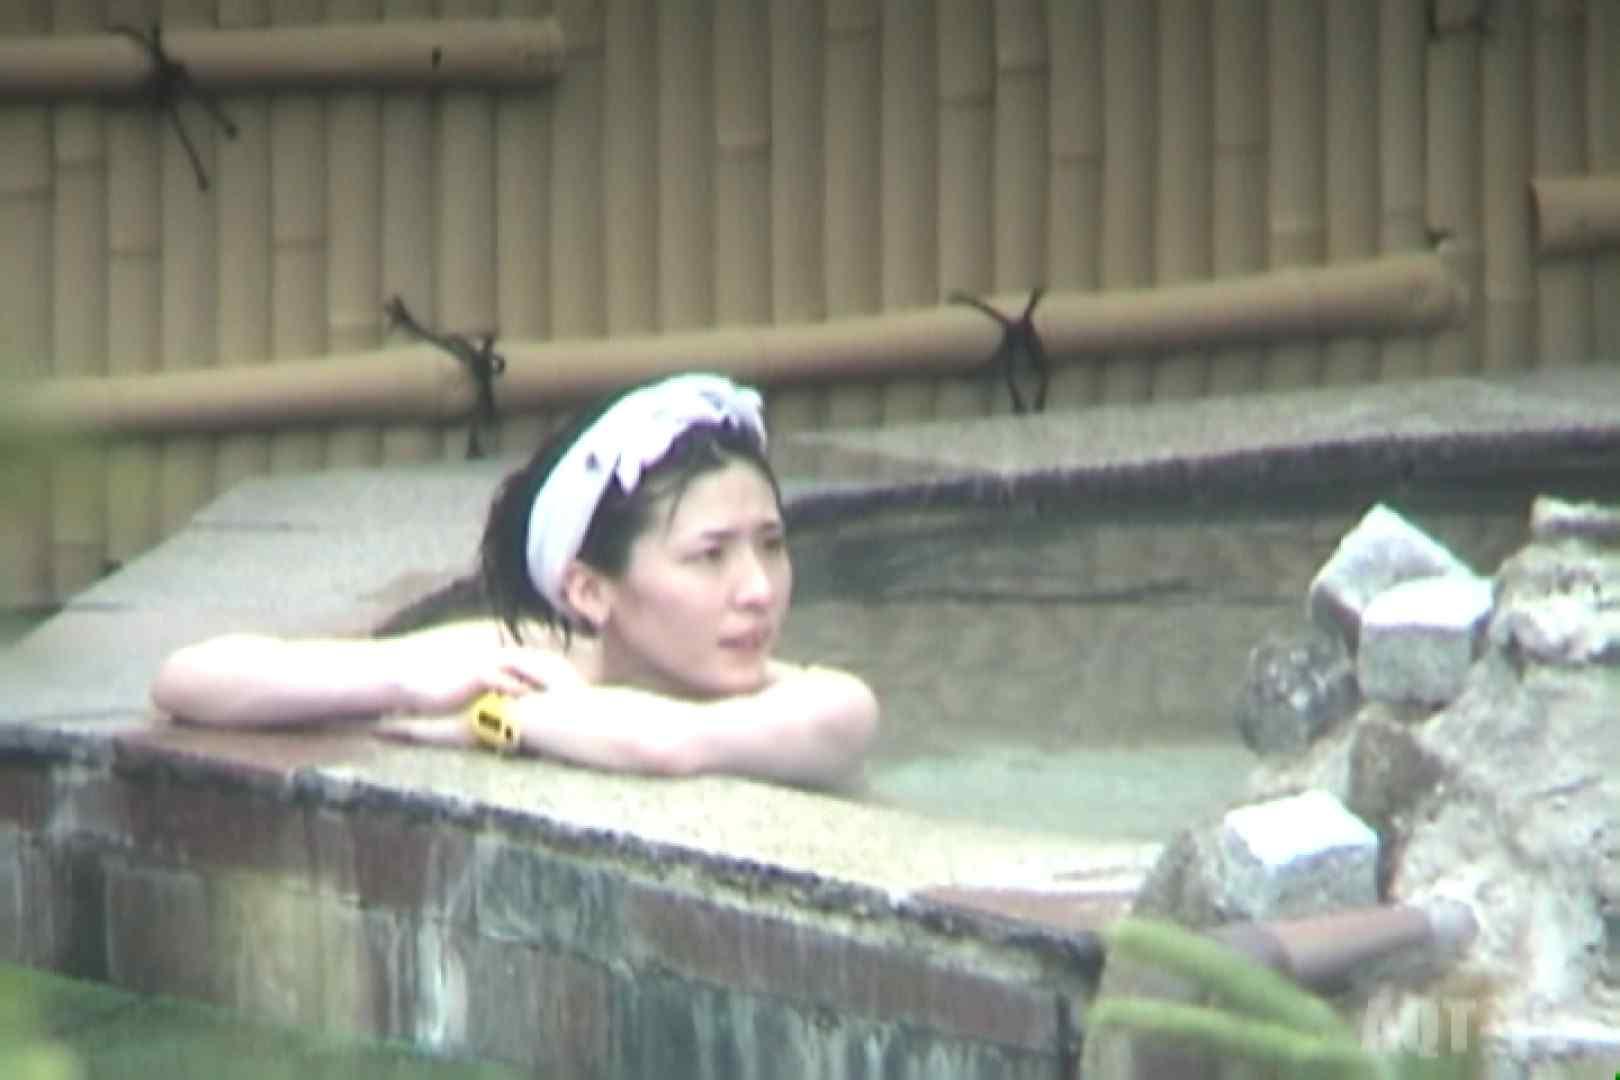 Aquaな露天風呂Vol.793 盗撮シリーズ   露天風呂編  93PIX 31